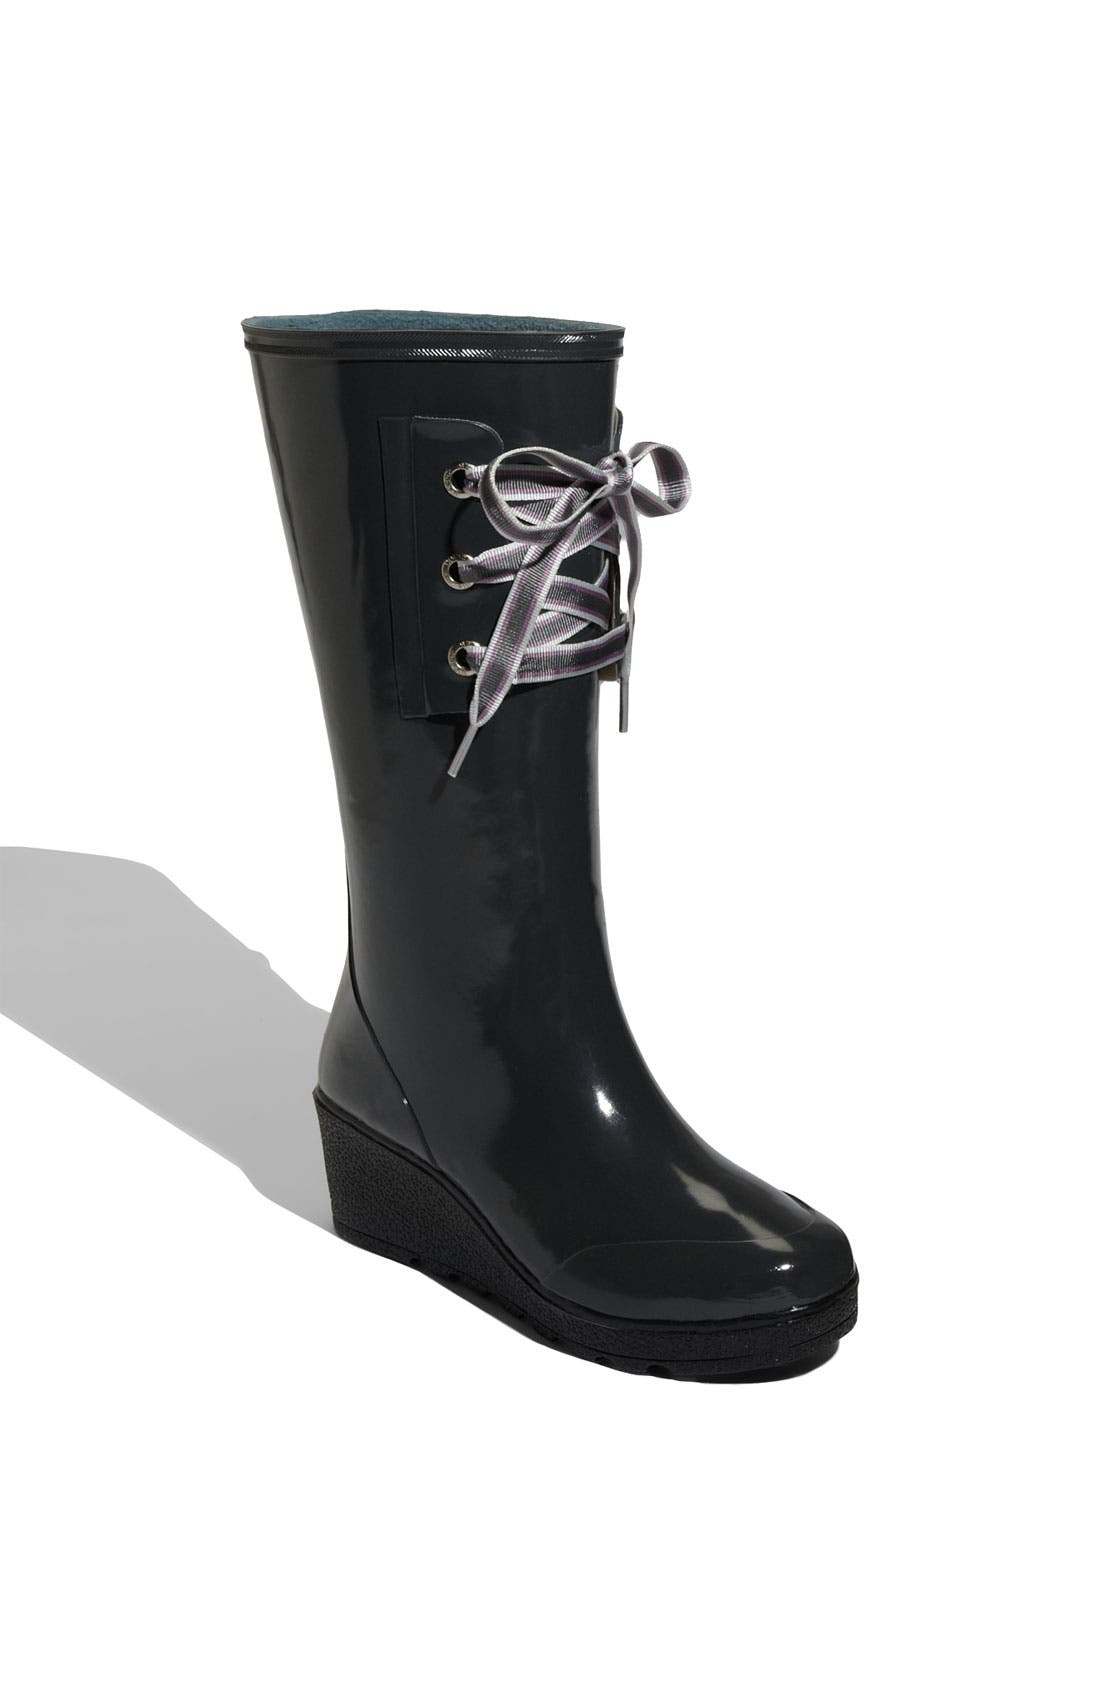 Main Image - Sperry Top-Sider® 'Sadie' Rain Boot